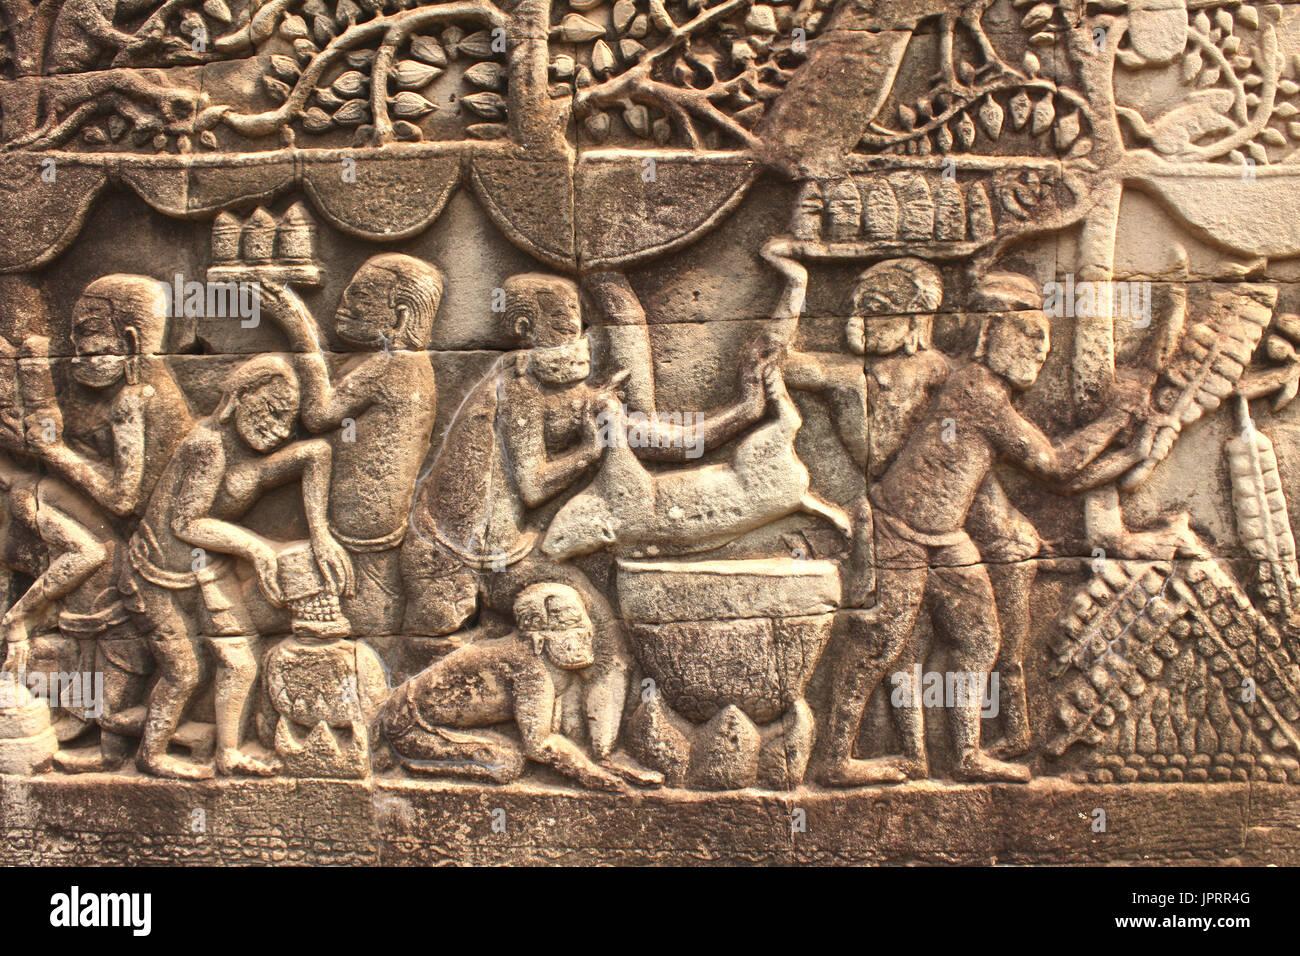 Cambodia close up sandstone relief carving stock photos